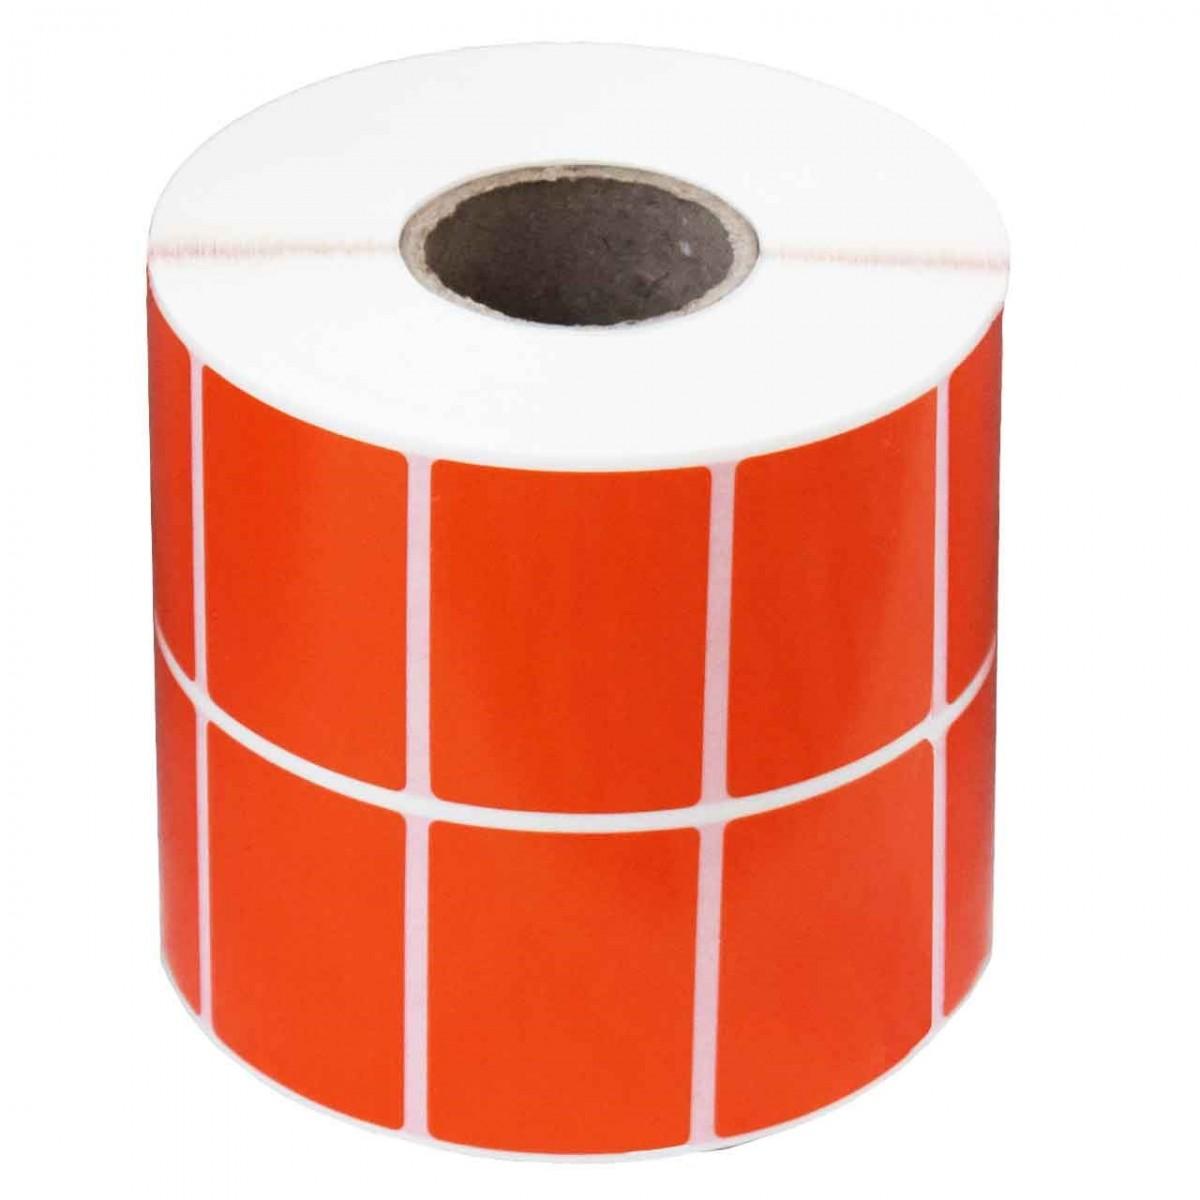 label-printer-label-megagostar-لیبل-نارنجی-مگاگستر-لیبل پرینتر-دی جی کالا-